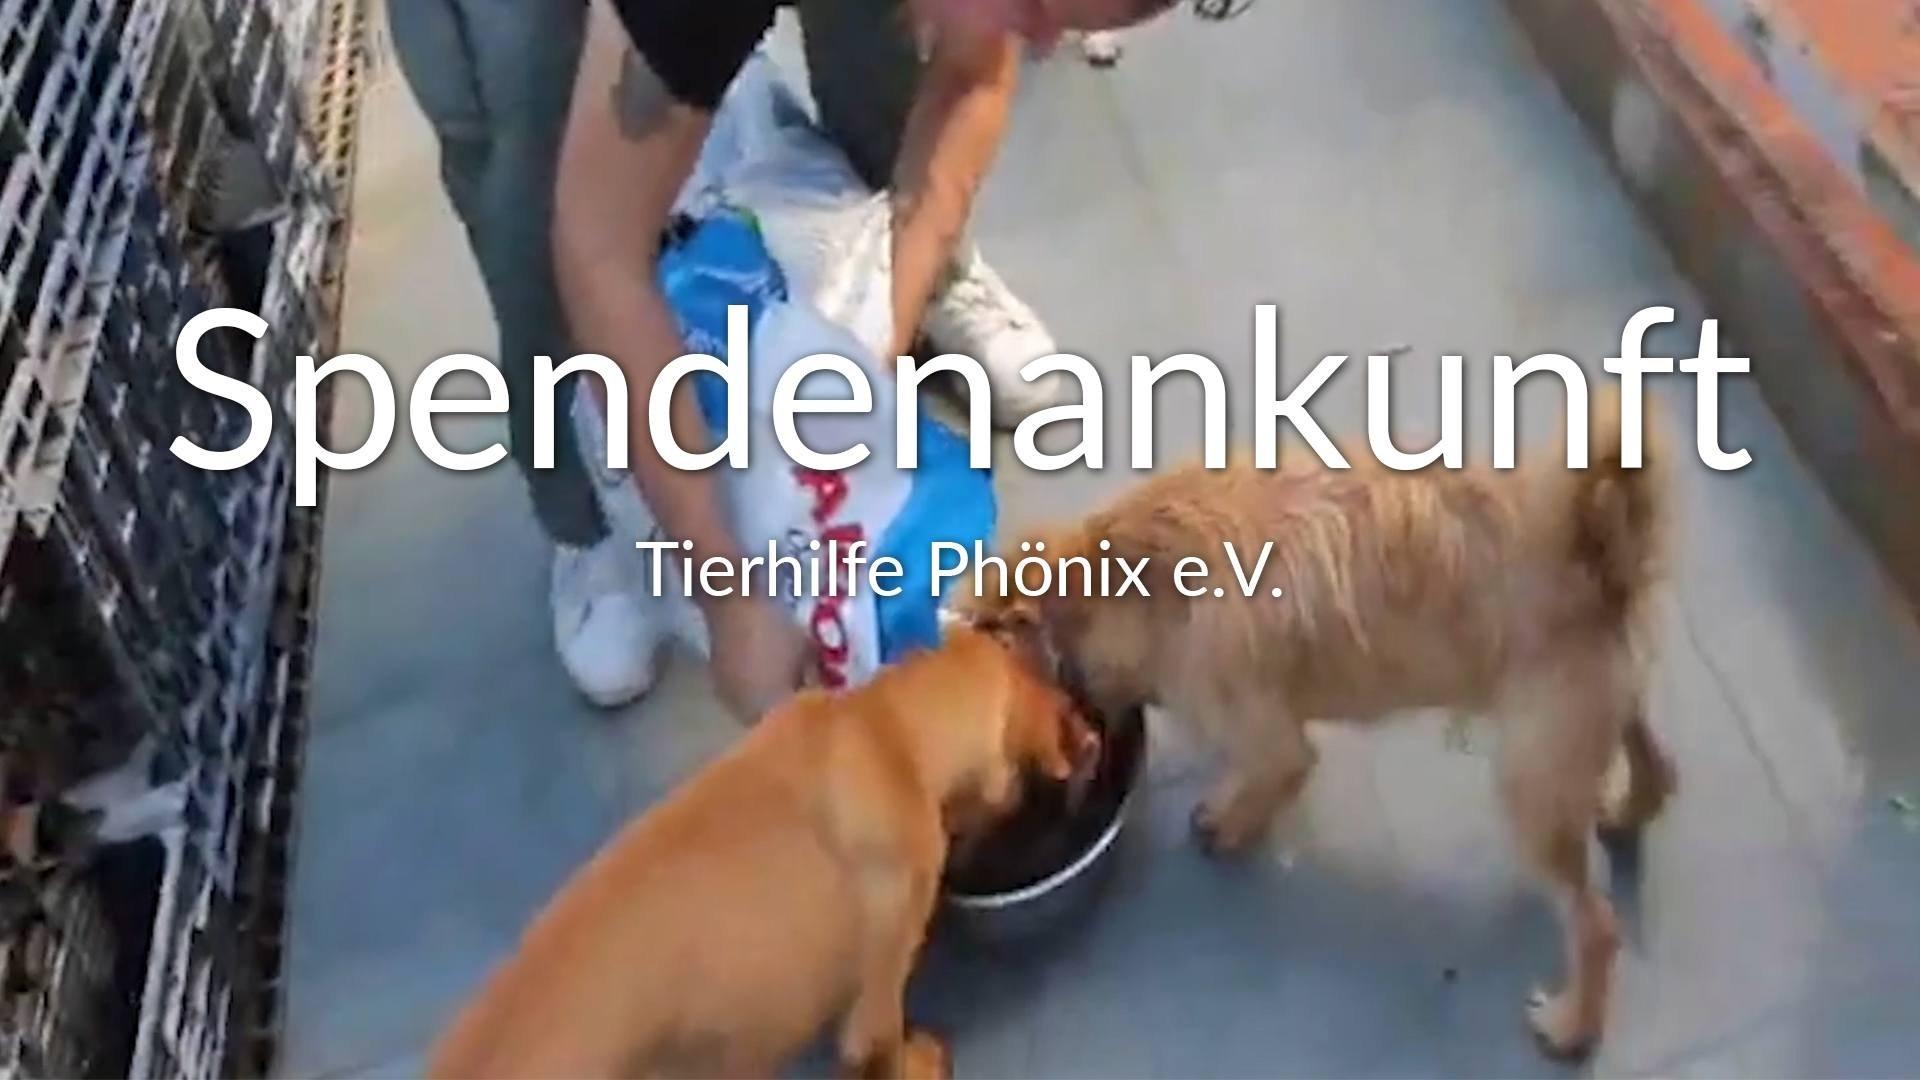 Tierhilfe Phönix e.V.-Futterspendenankunft-oktober 2019-WL-Spanien (1)